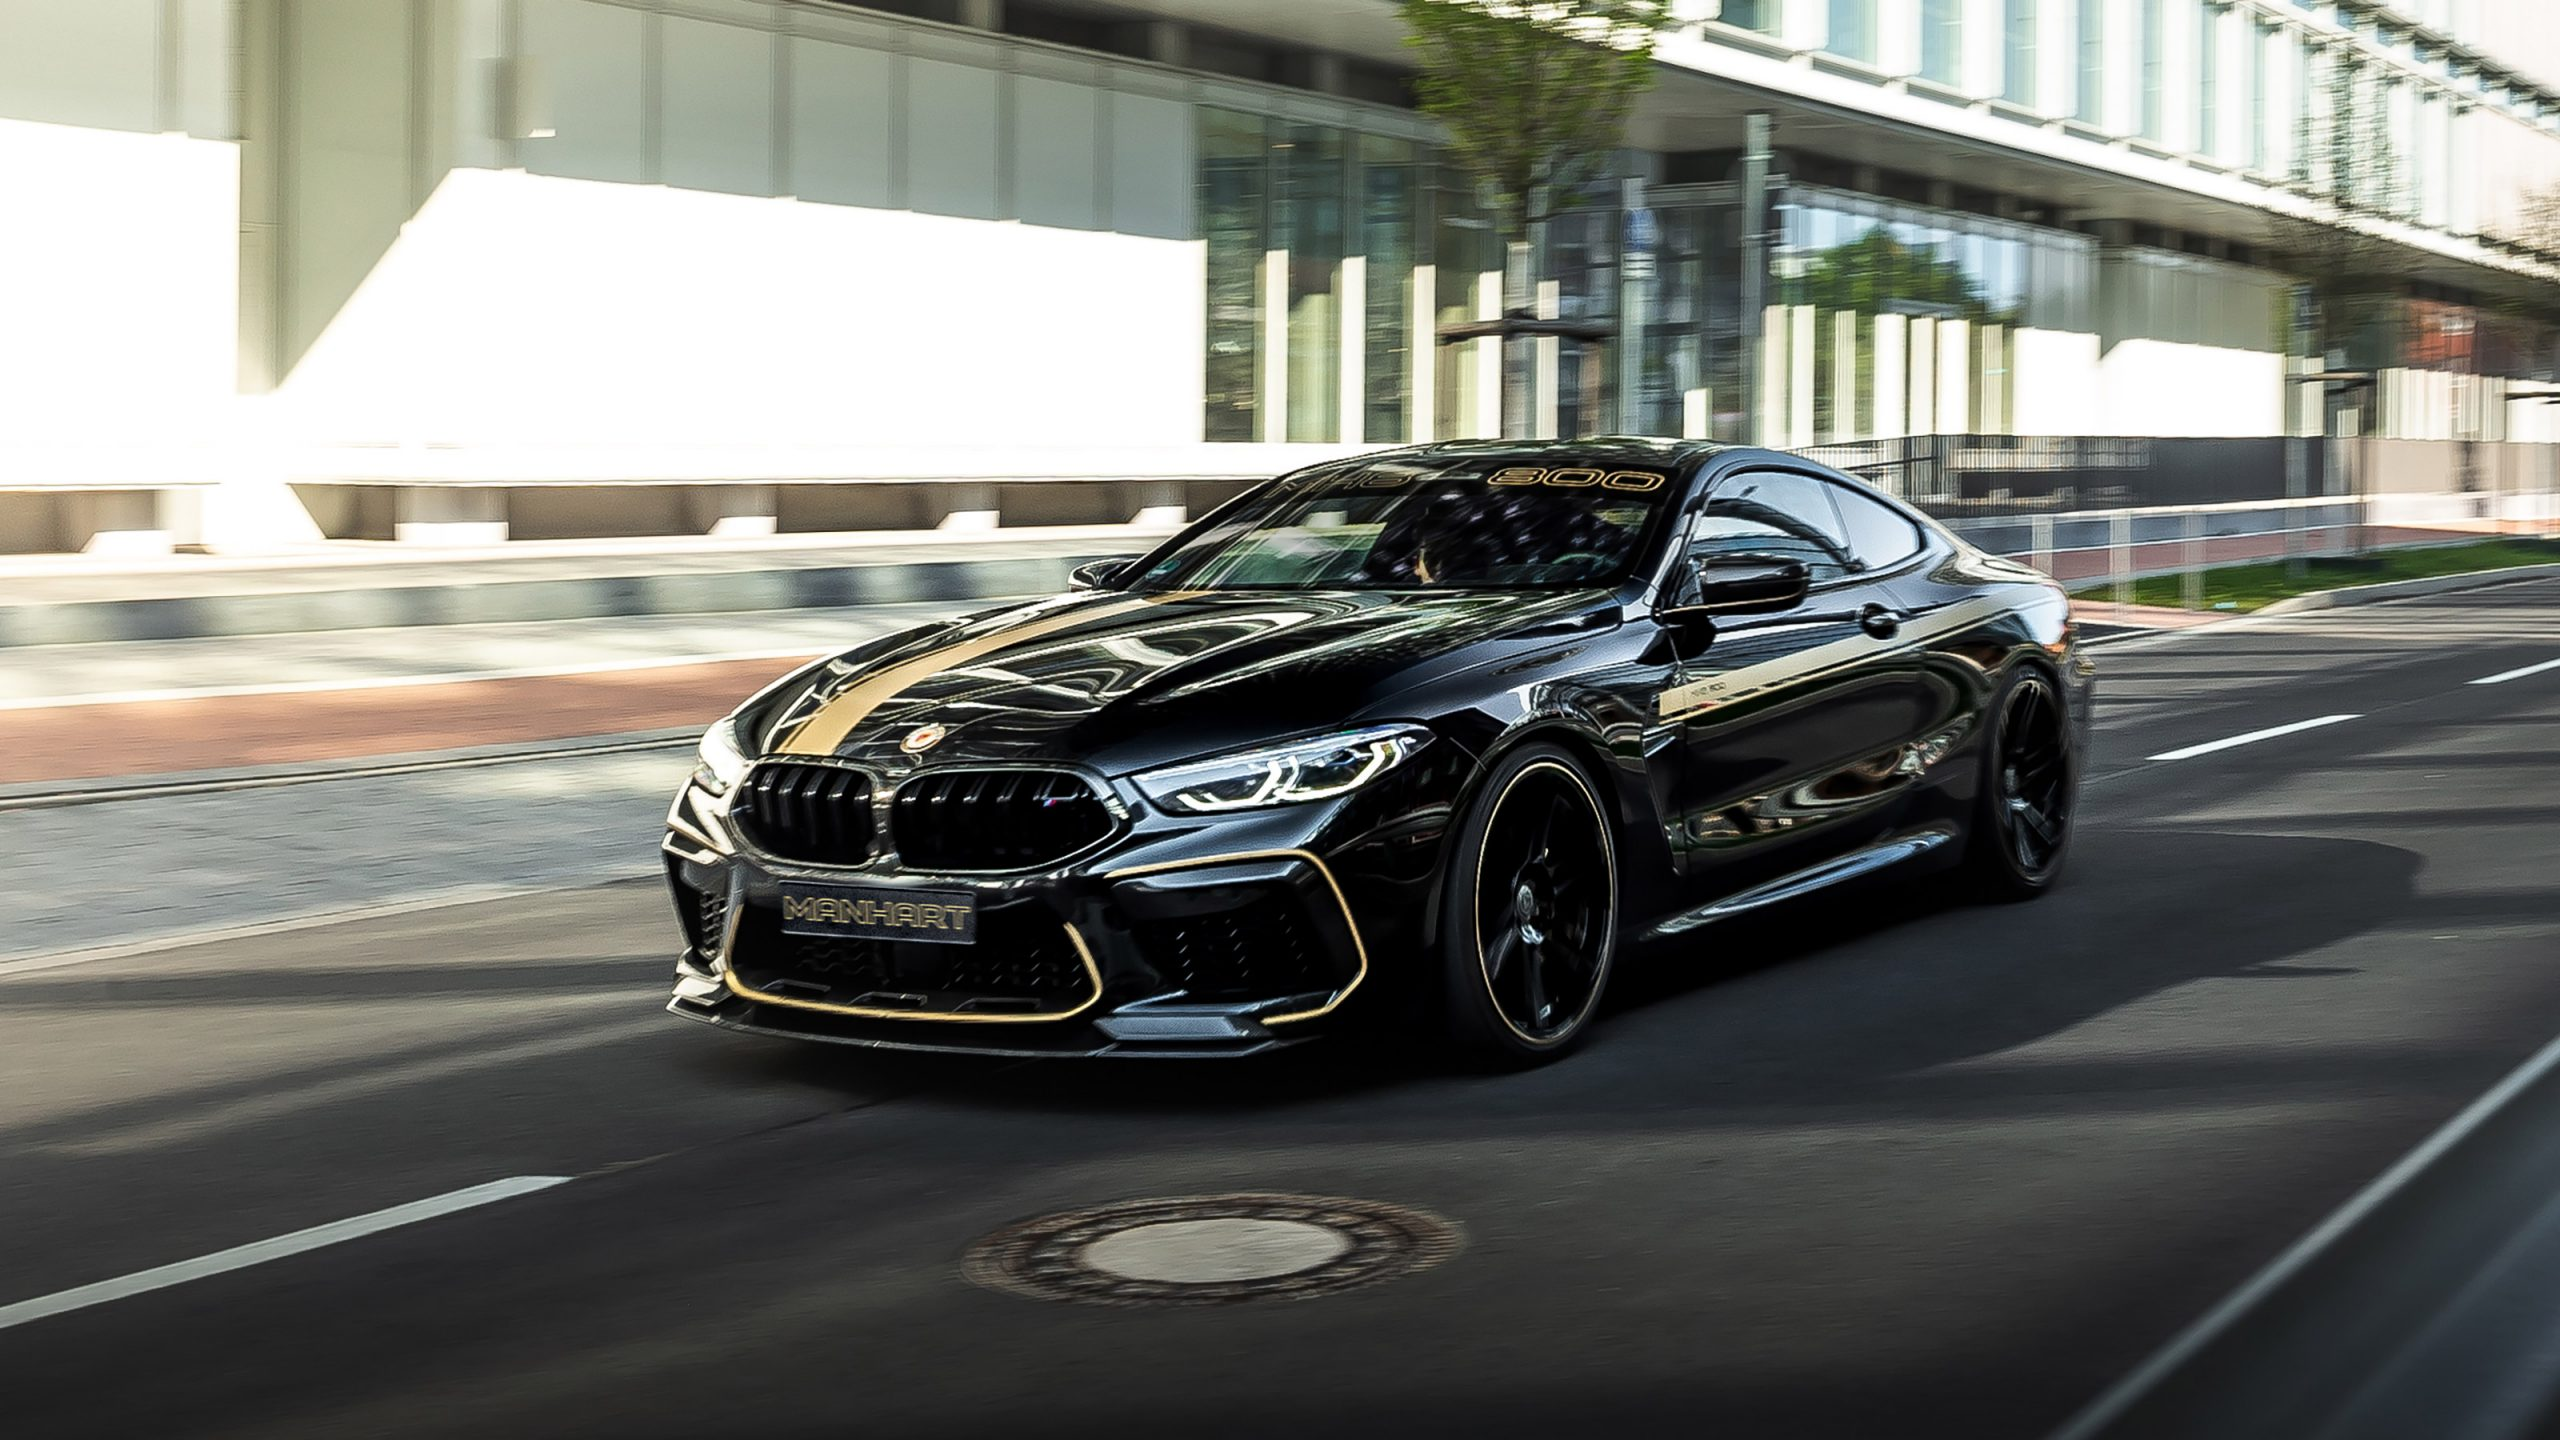 Manhart-BMW-M8-Competition-12-scaled.jpg